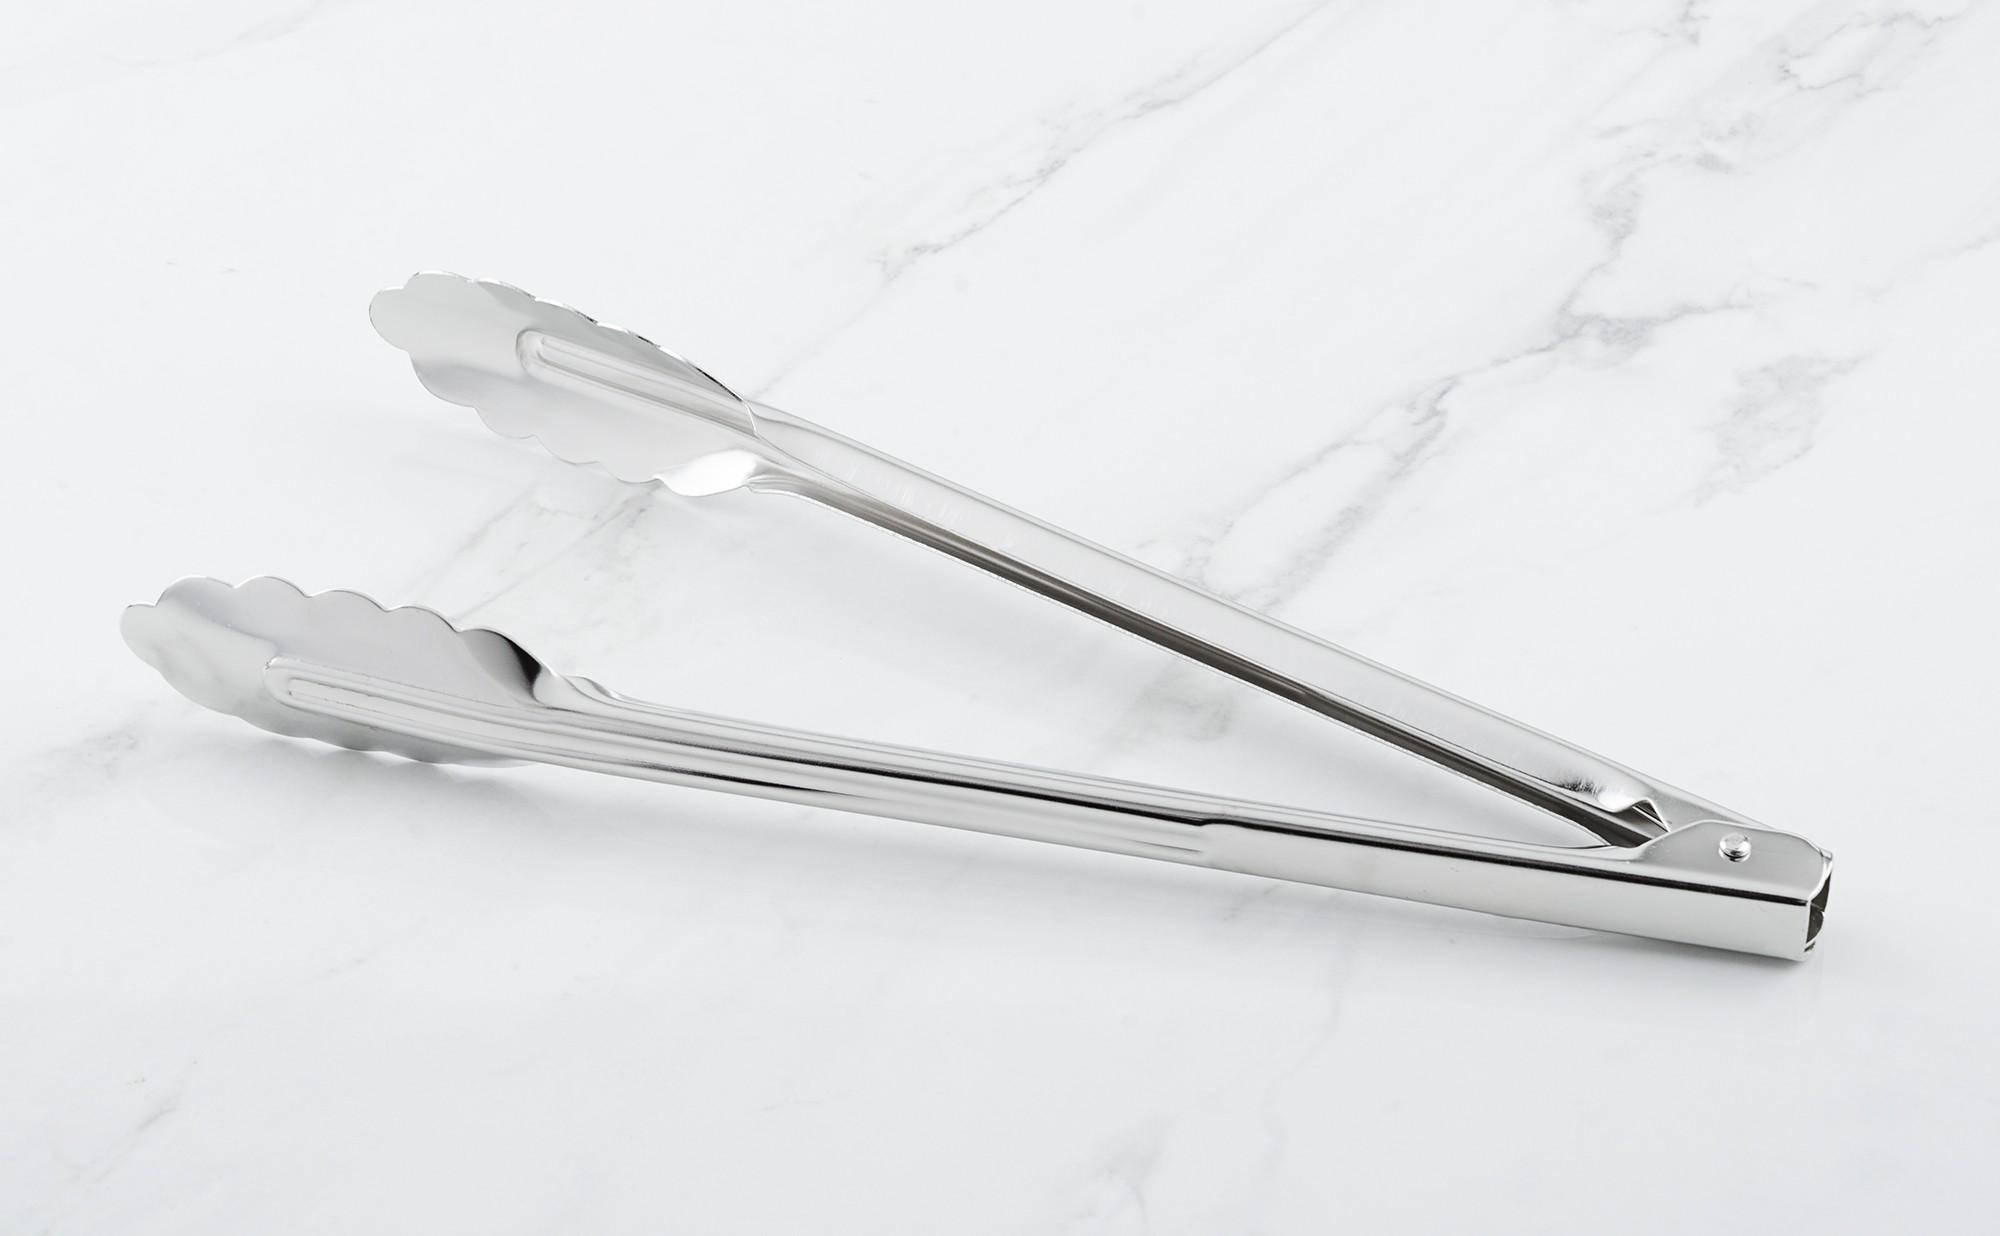 Pince inox feuille de ch ne multi usage 30 cm colichef for Feuille inox cuisine